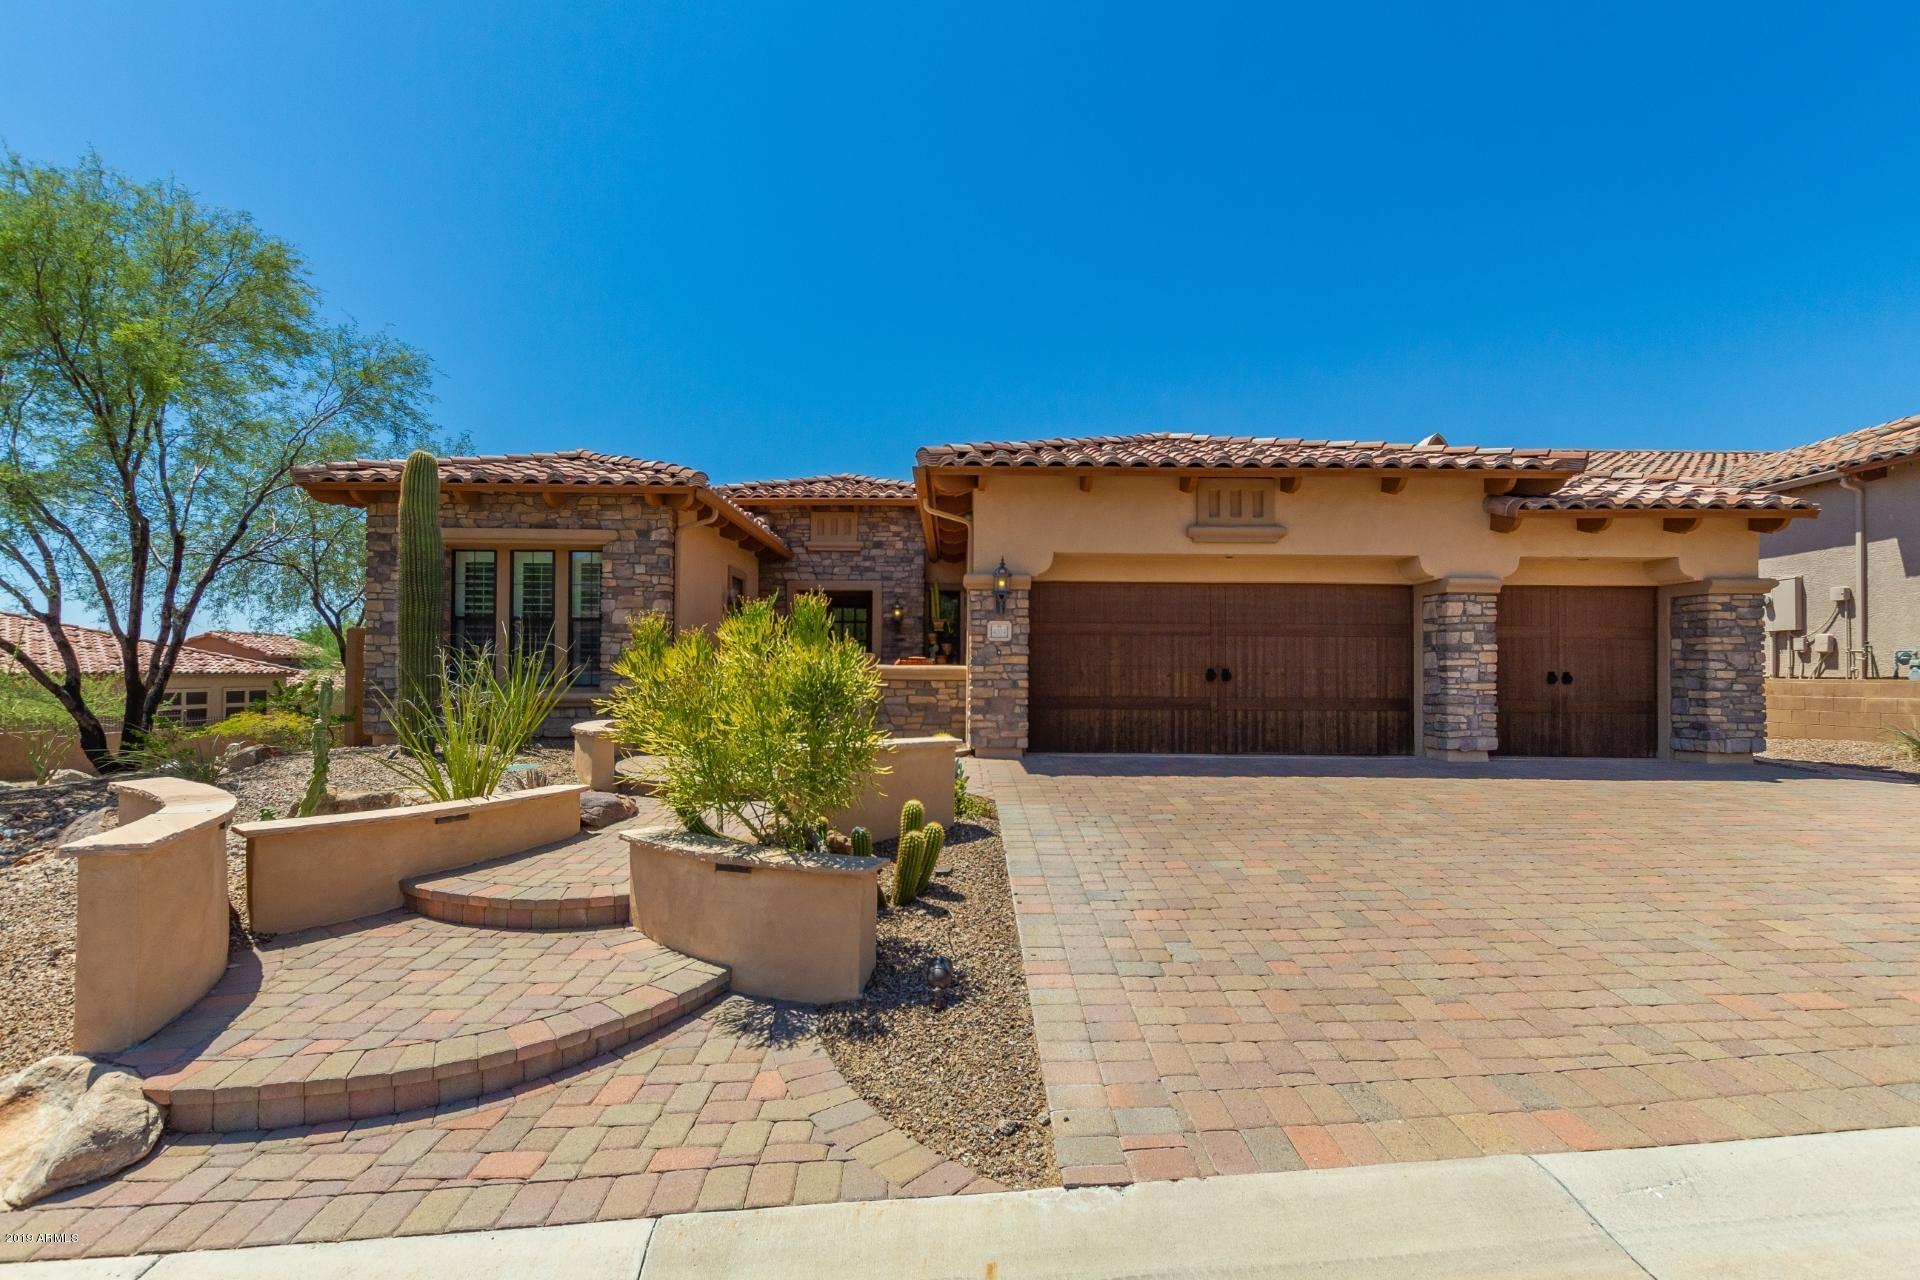 Photo of 4004 N HIGHVIEW Circle, Mesa, AZ 85207